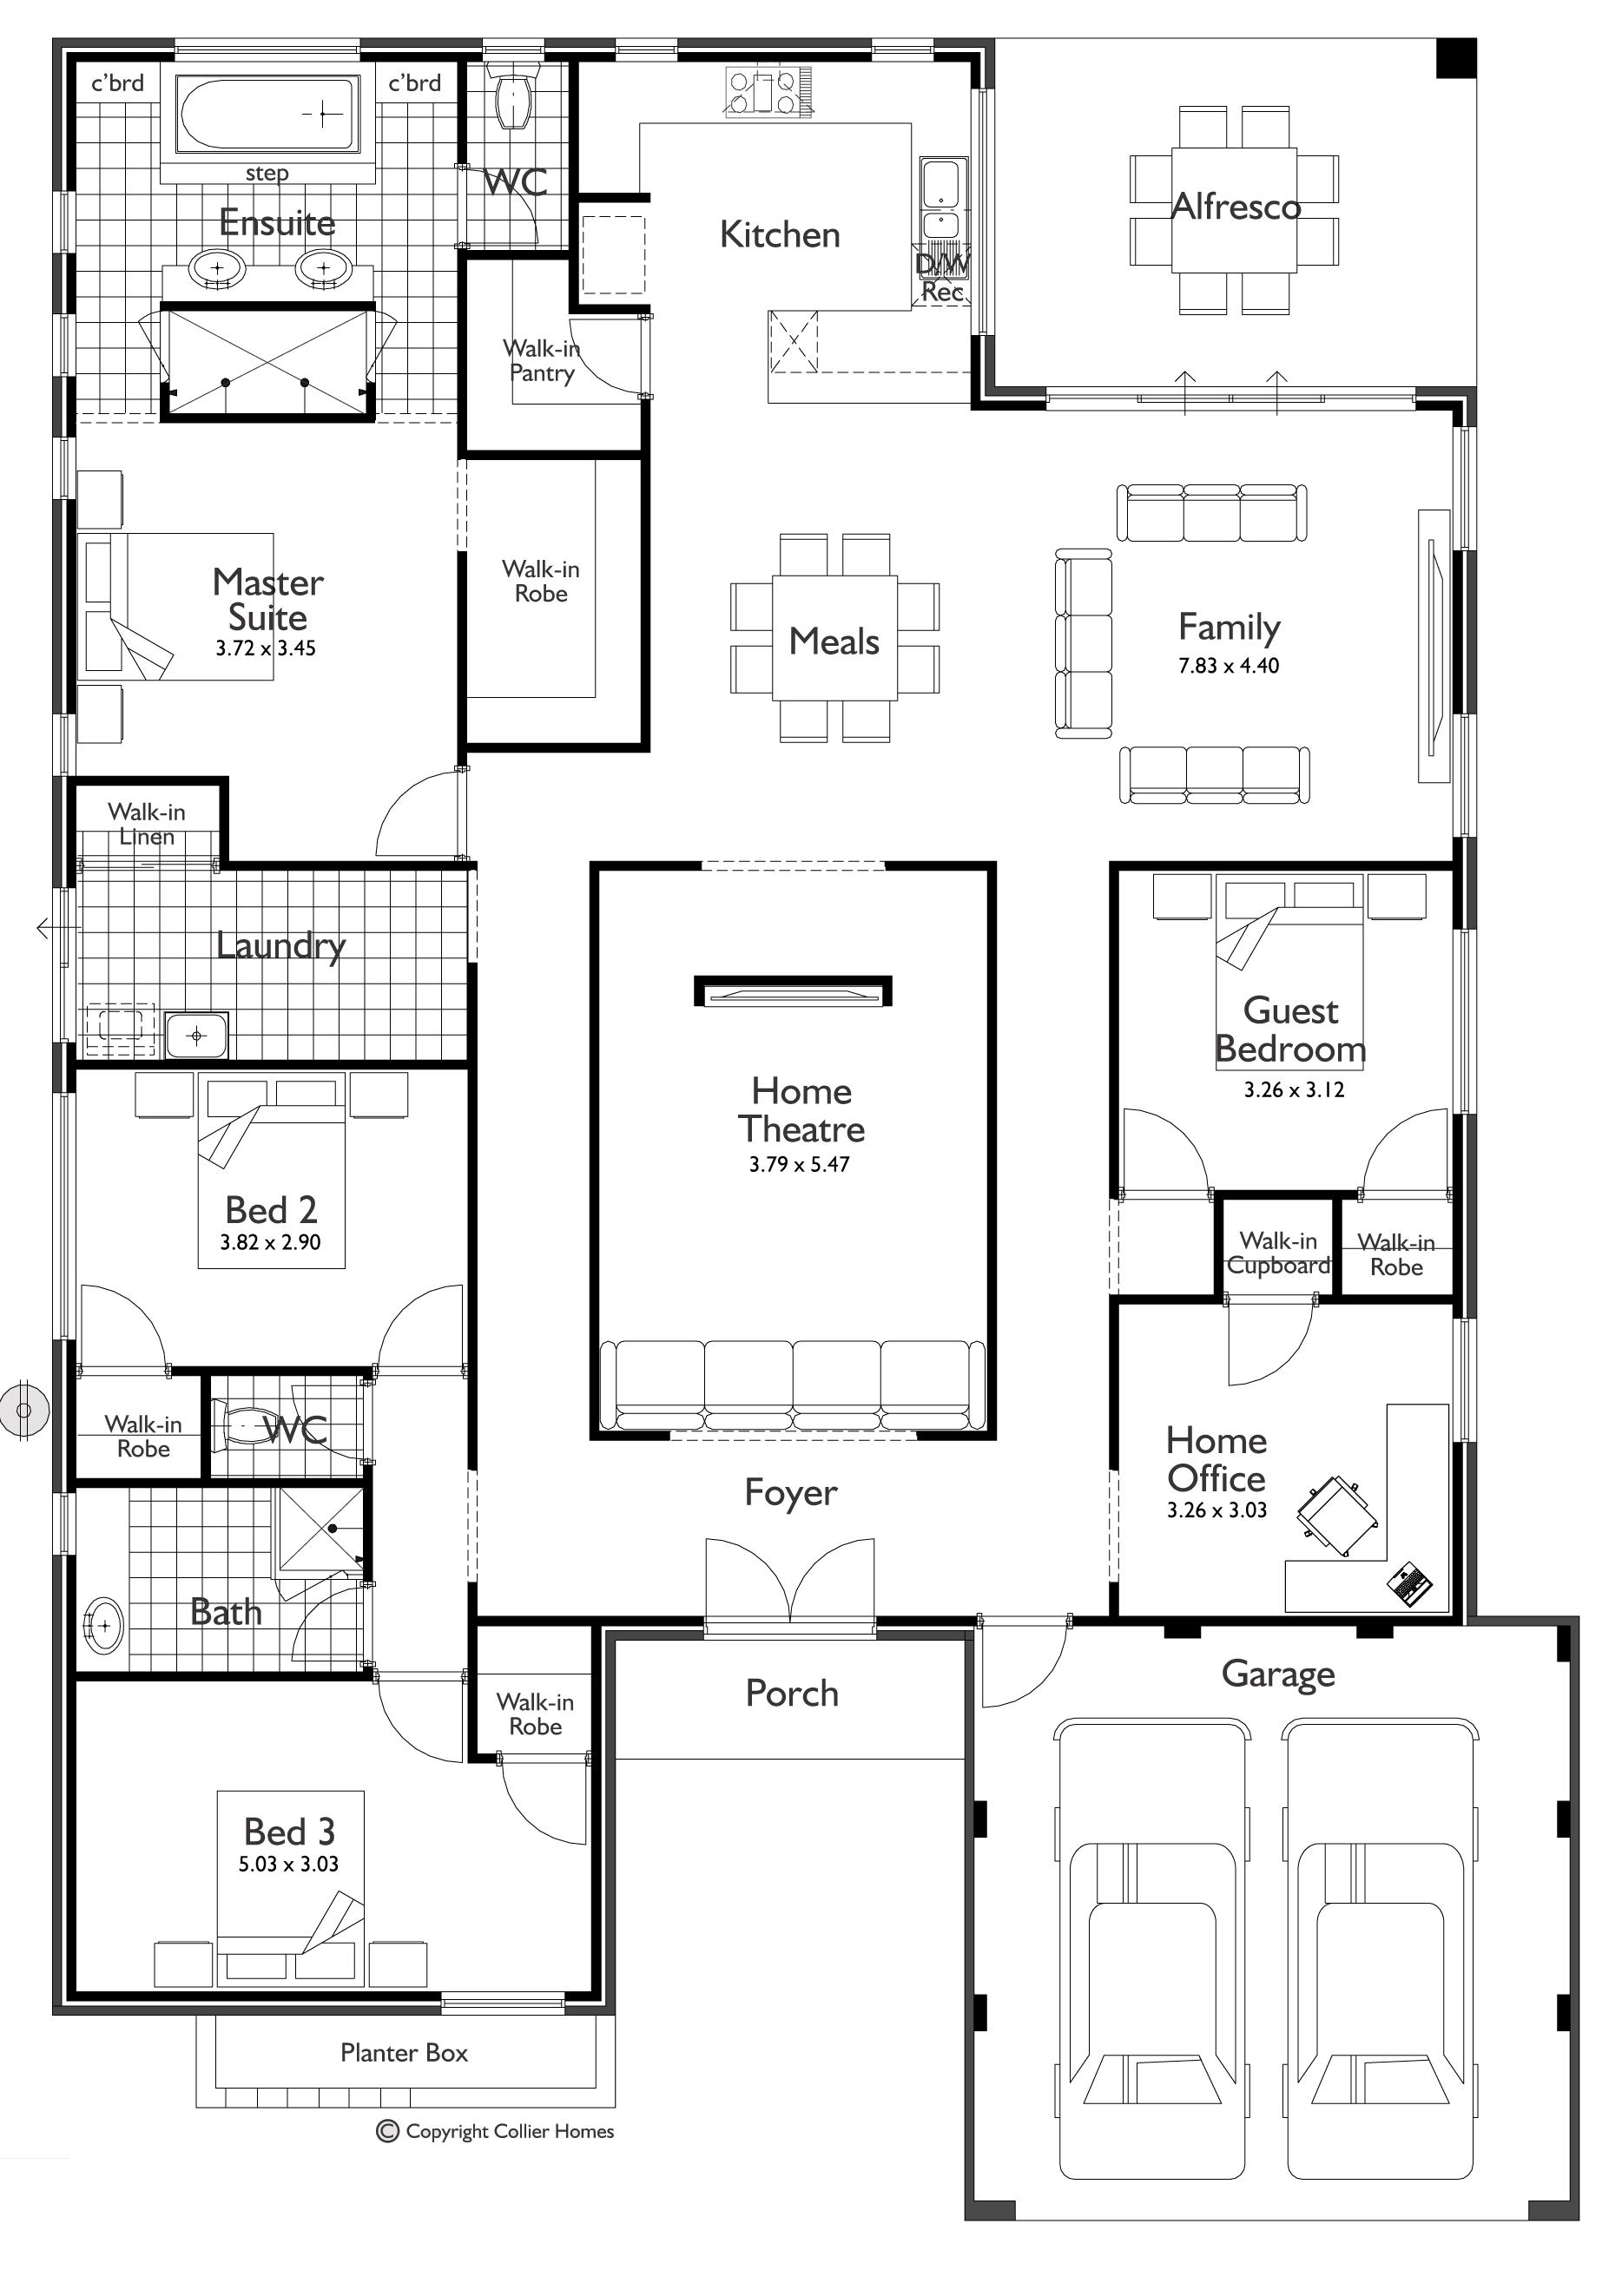 Floor Plan Friday Theatre Room House plans, Dream house